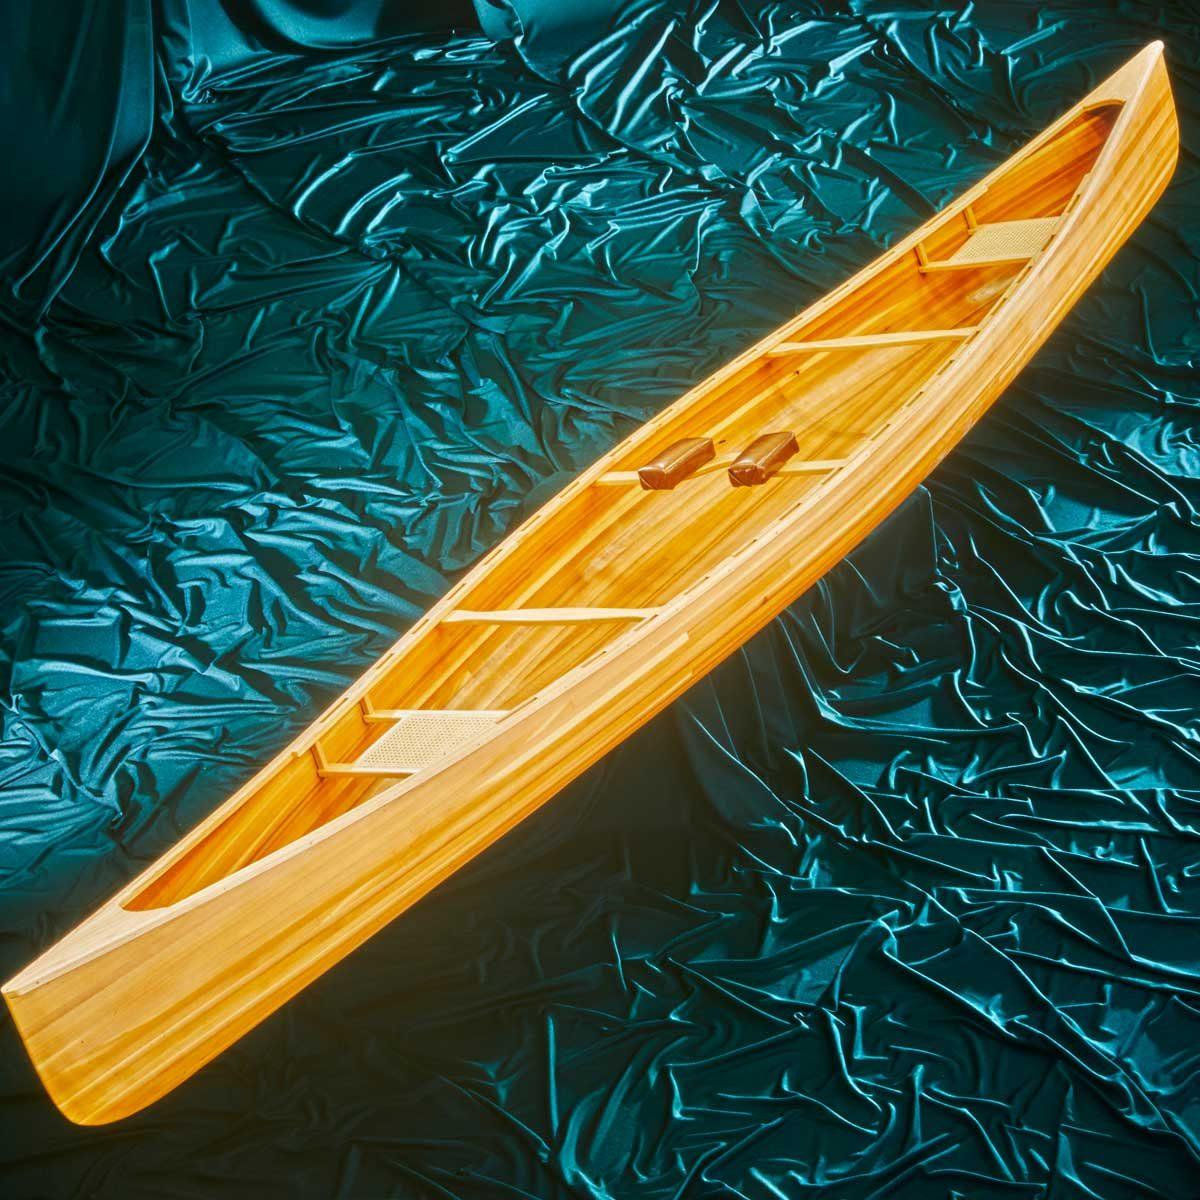 How to Build a Canoe | Family Handyman